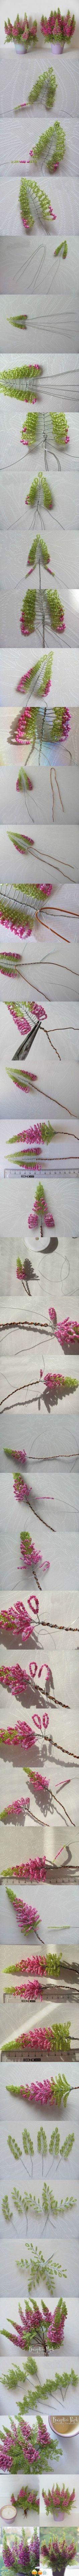 Inspiring bead ferns!!